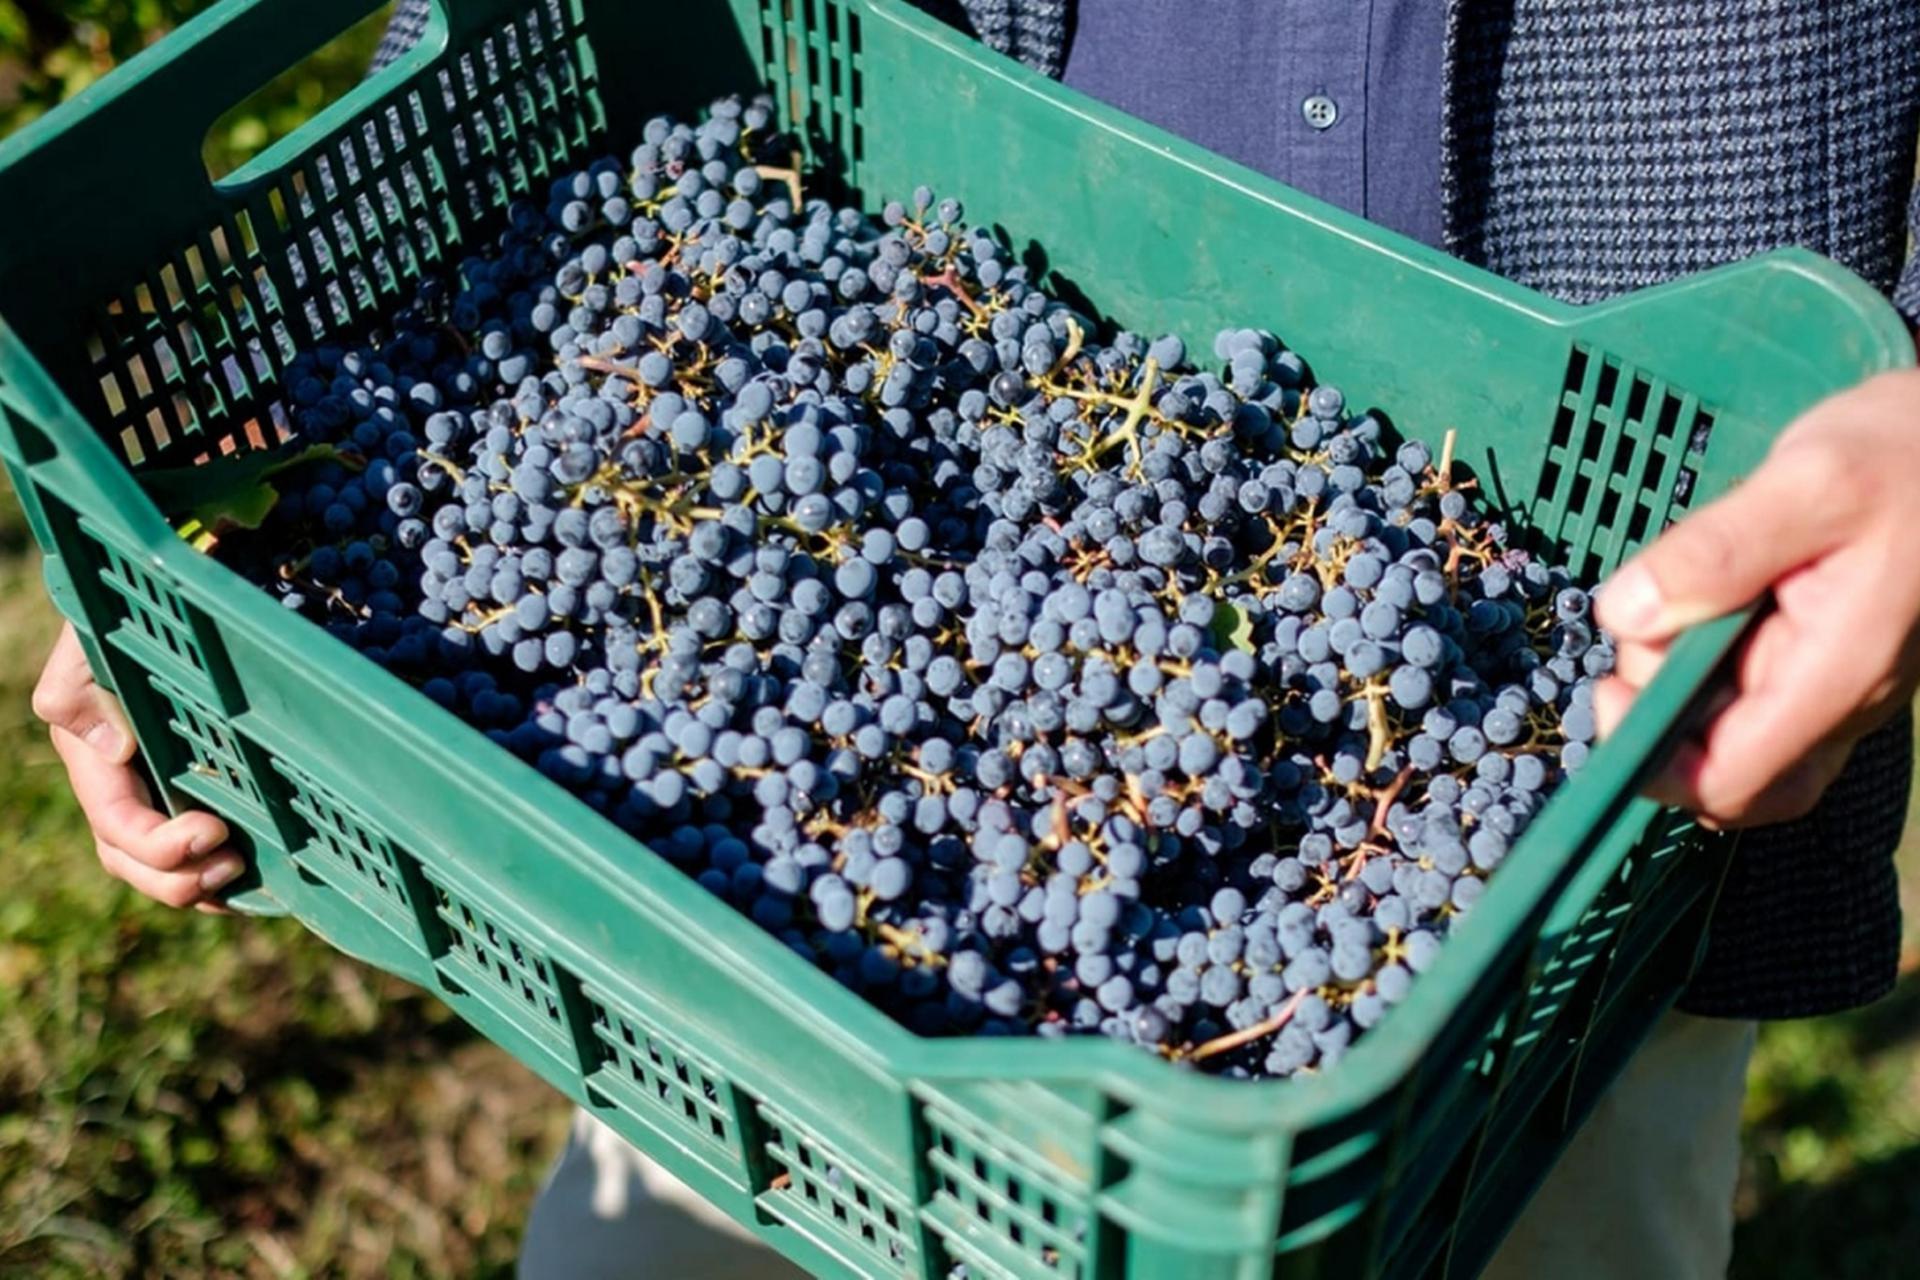 Agriturismo Toskana Schönes Weingut in der Chianti Region der Toskana   myitalyselection.de